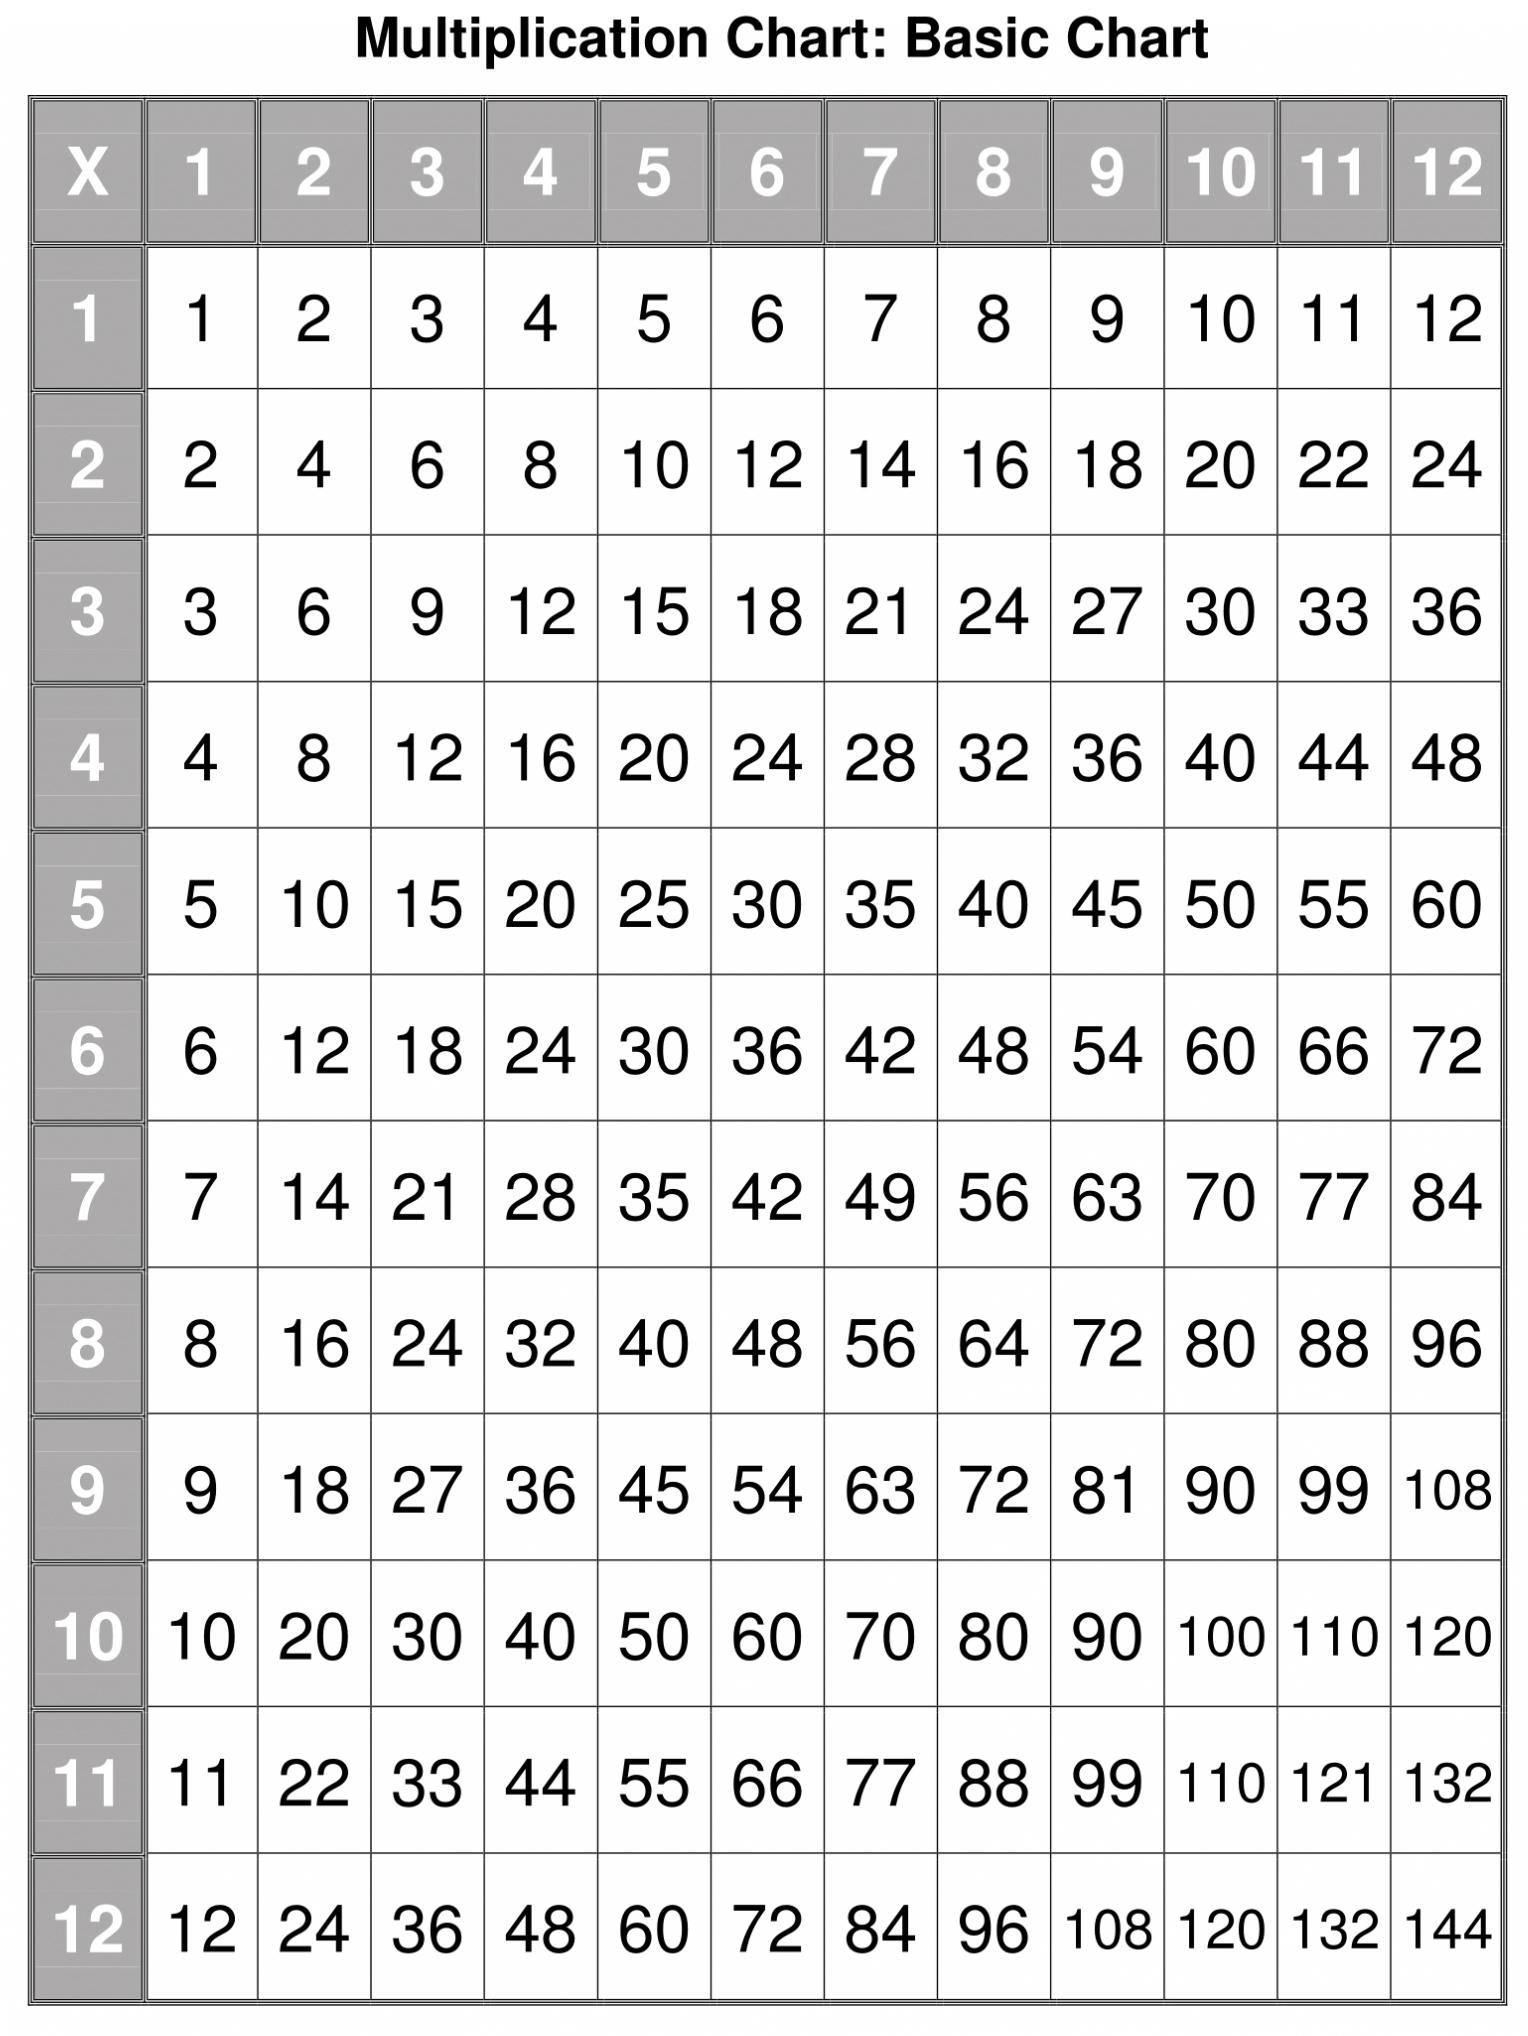 Printable Multiplication Table Pdf | Multiplication Charts within Printable Multiplication Table Pdf